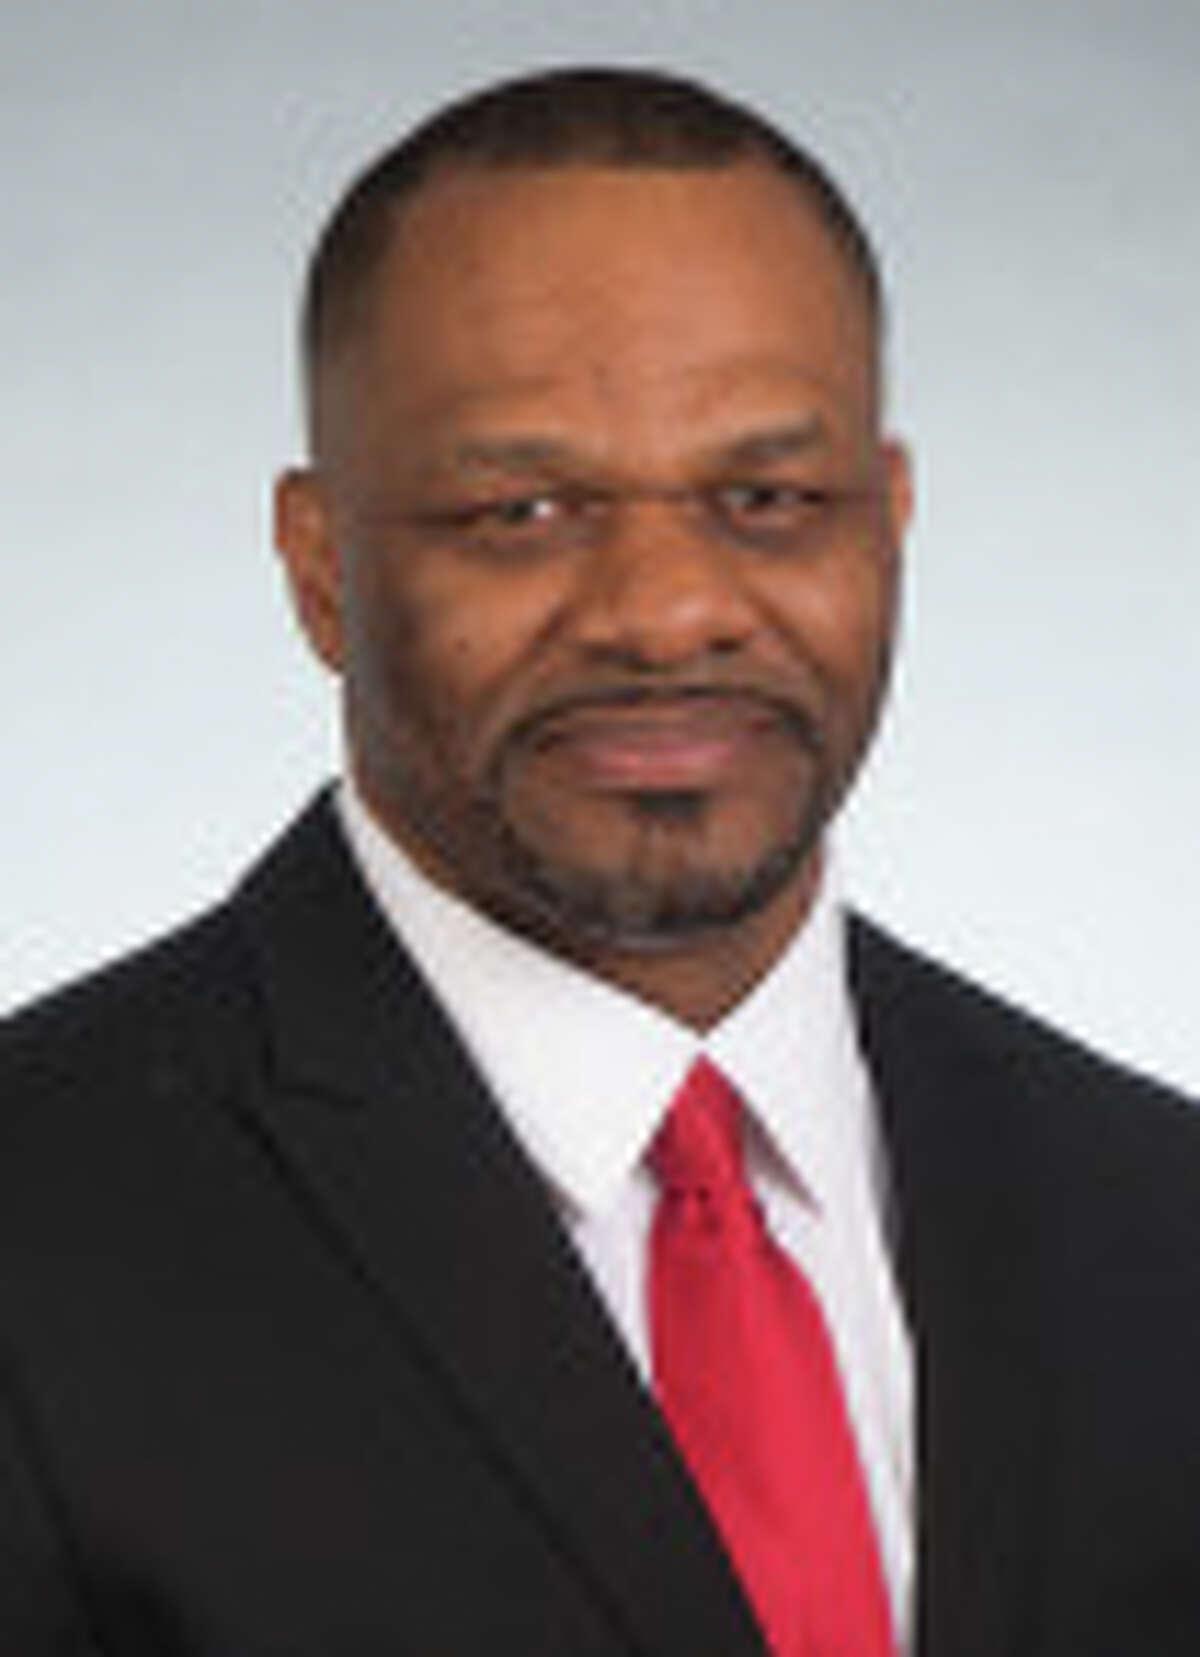 Ronald Hughey, UH women's basketball coach